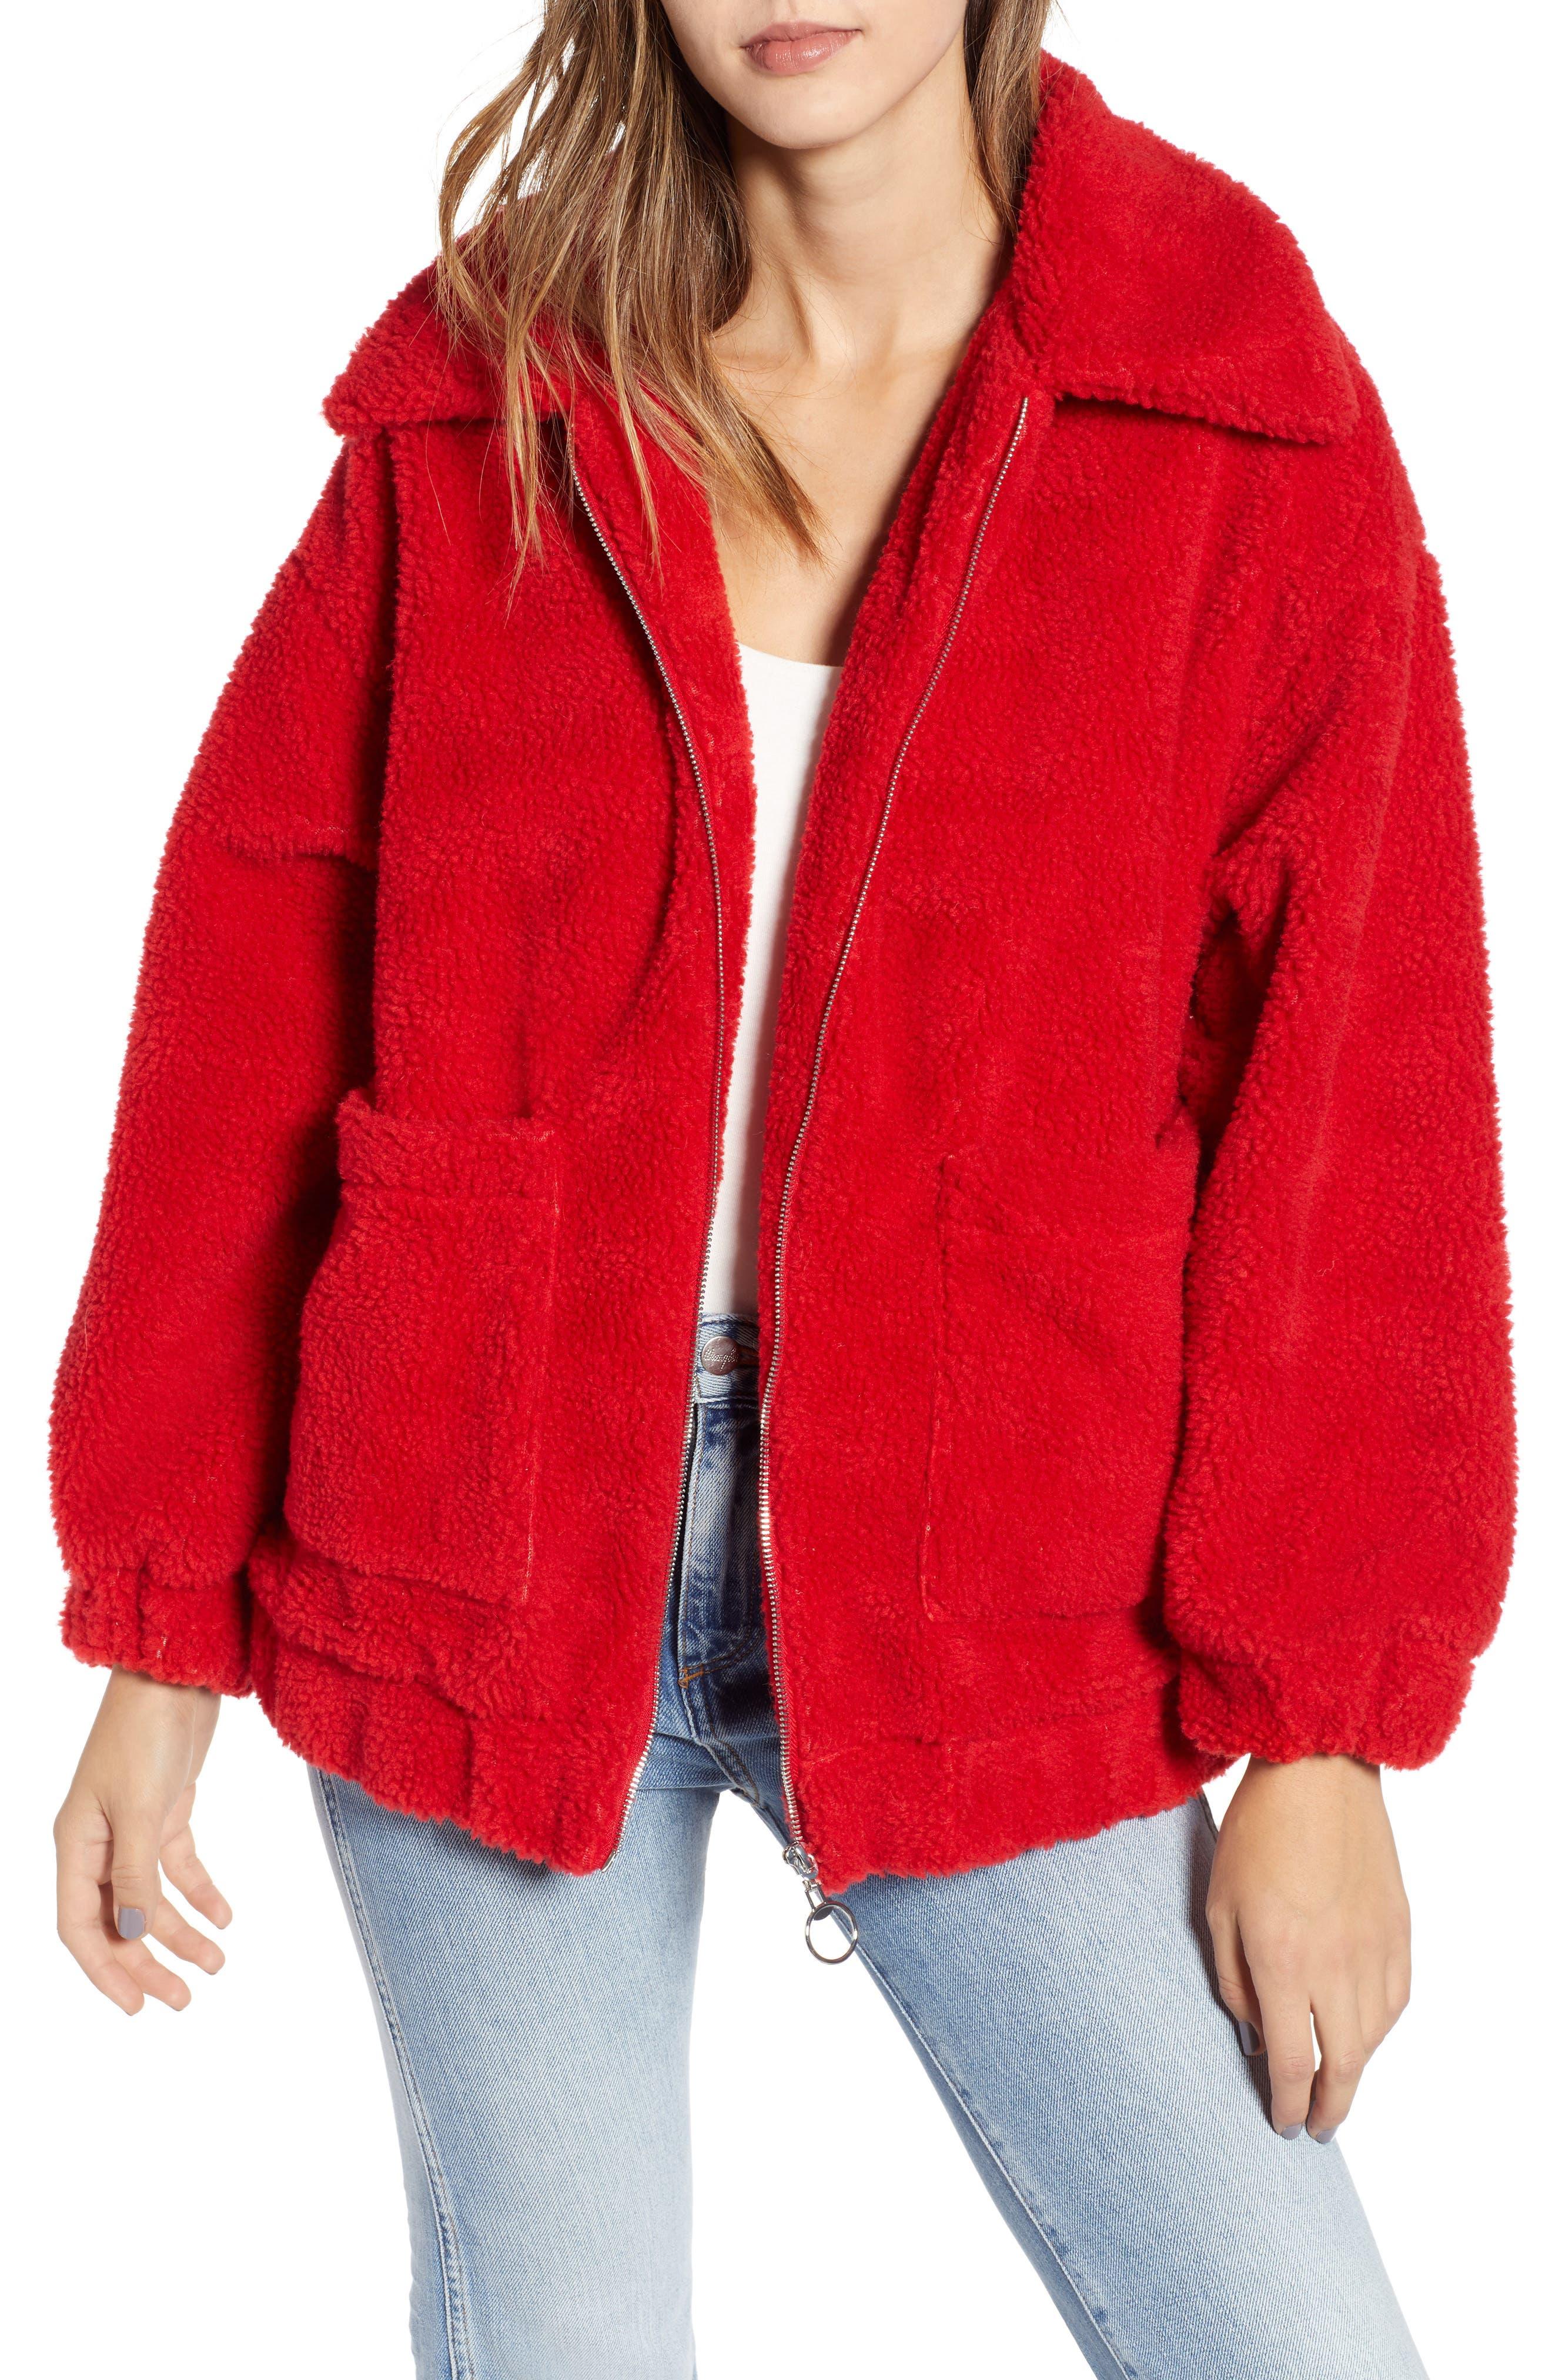 Oversized Fleece Jacket,                             Main thumbnail 1, color,                             RED